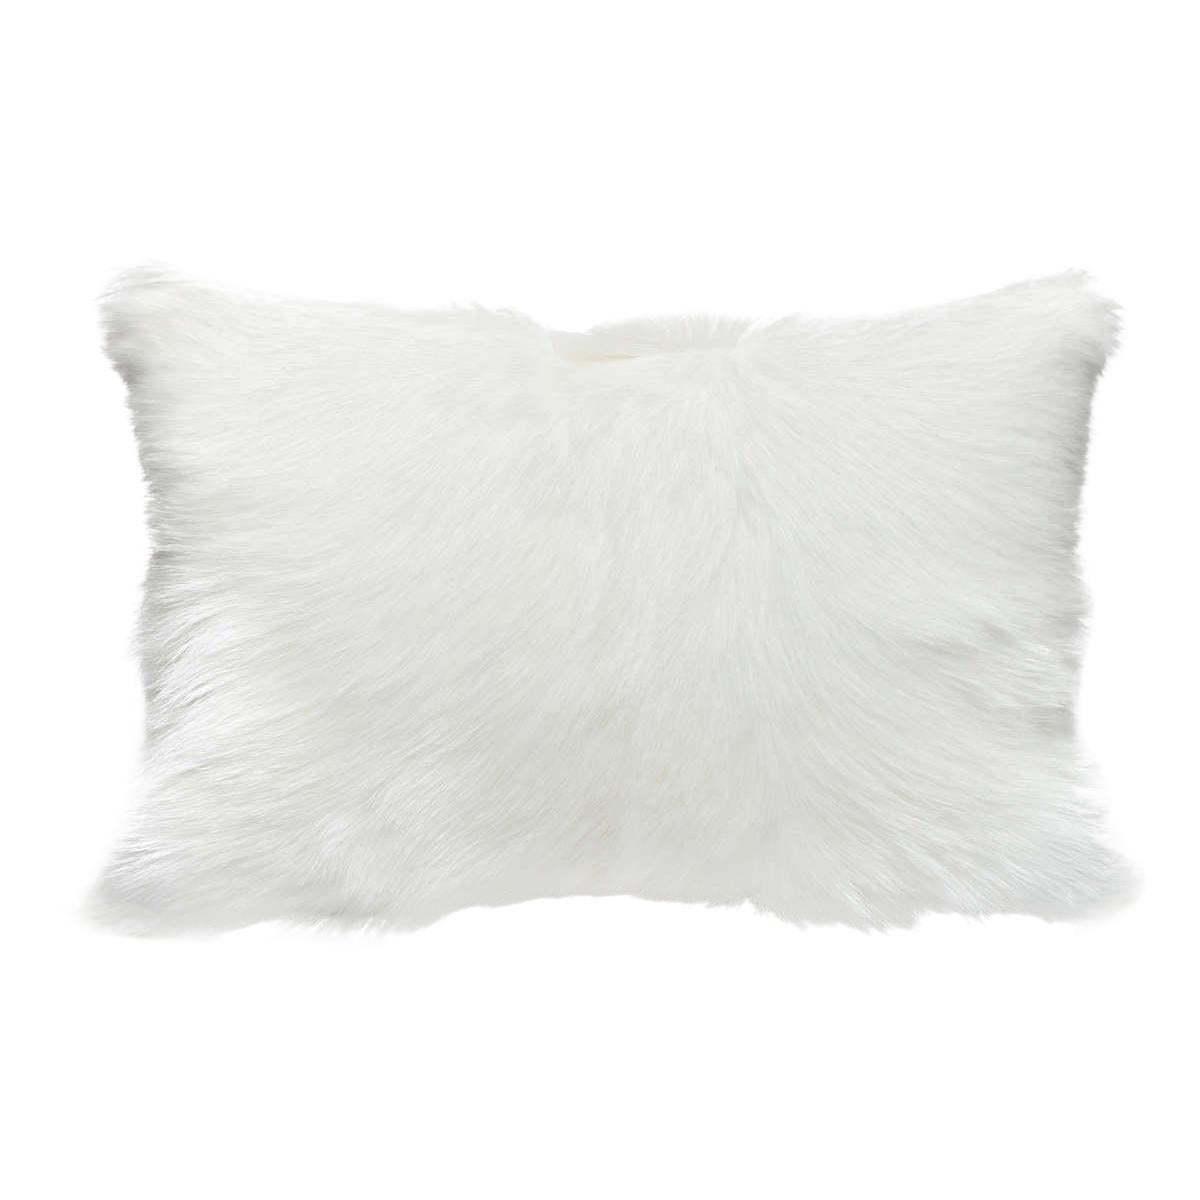 Goat Hair Pillow Fur Cushion, Natural White Customized